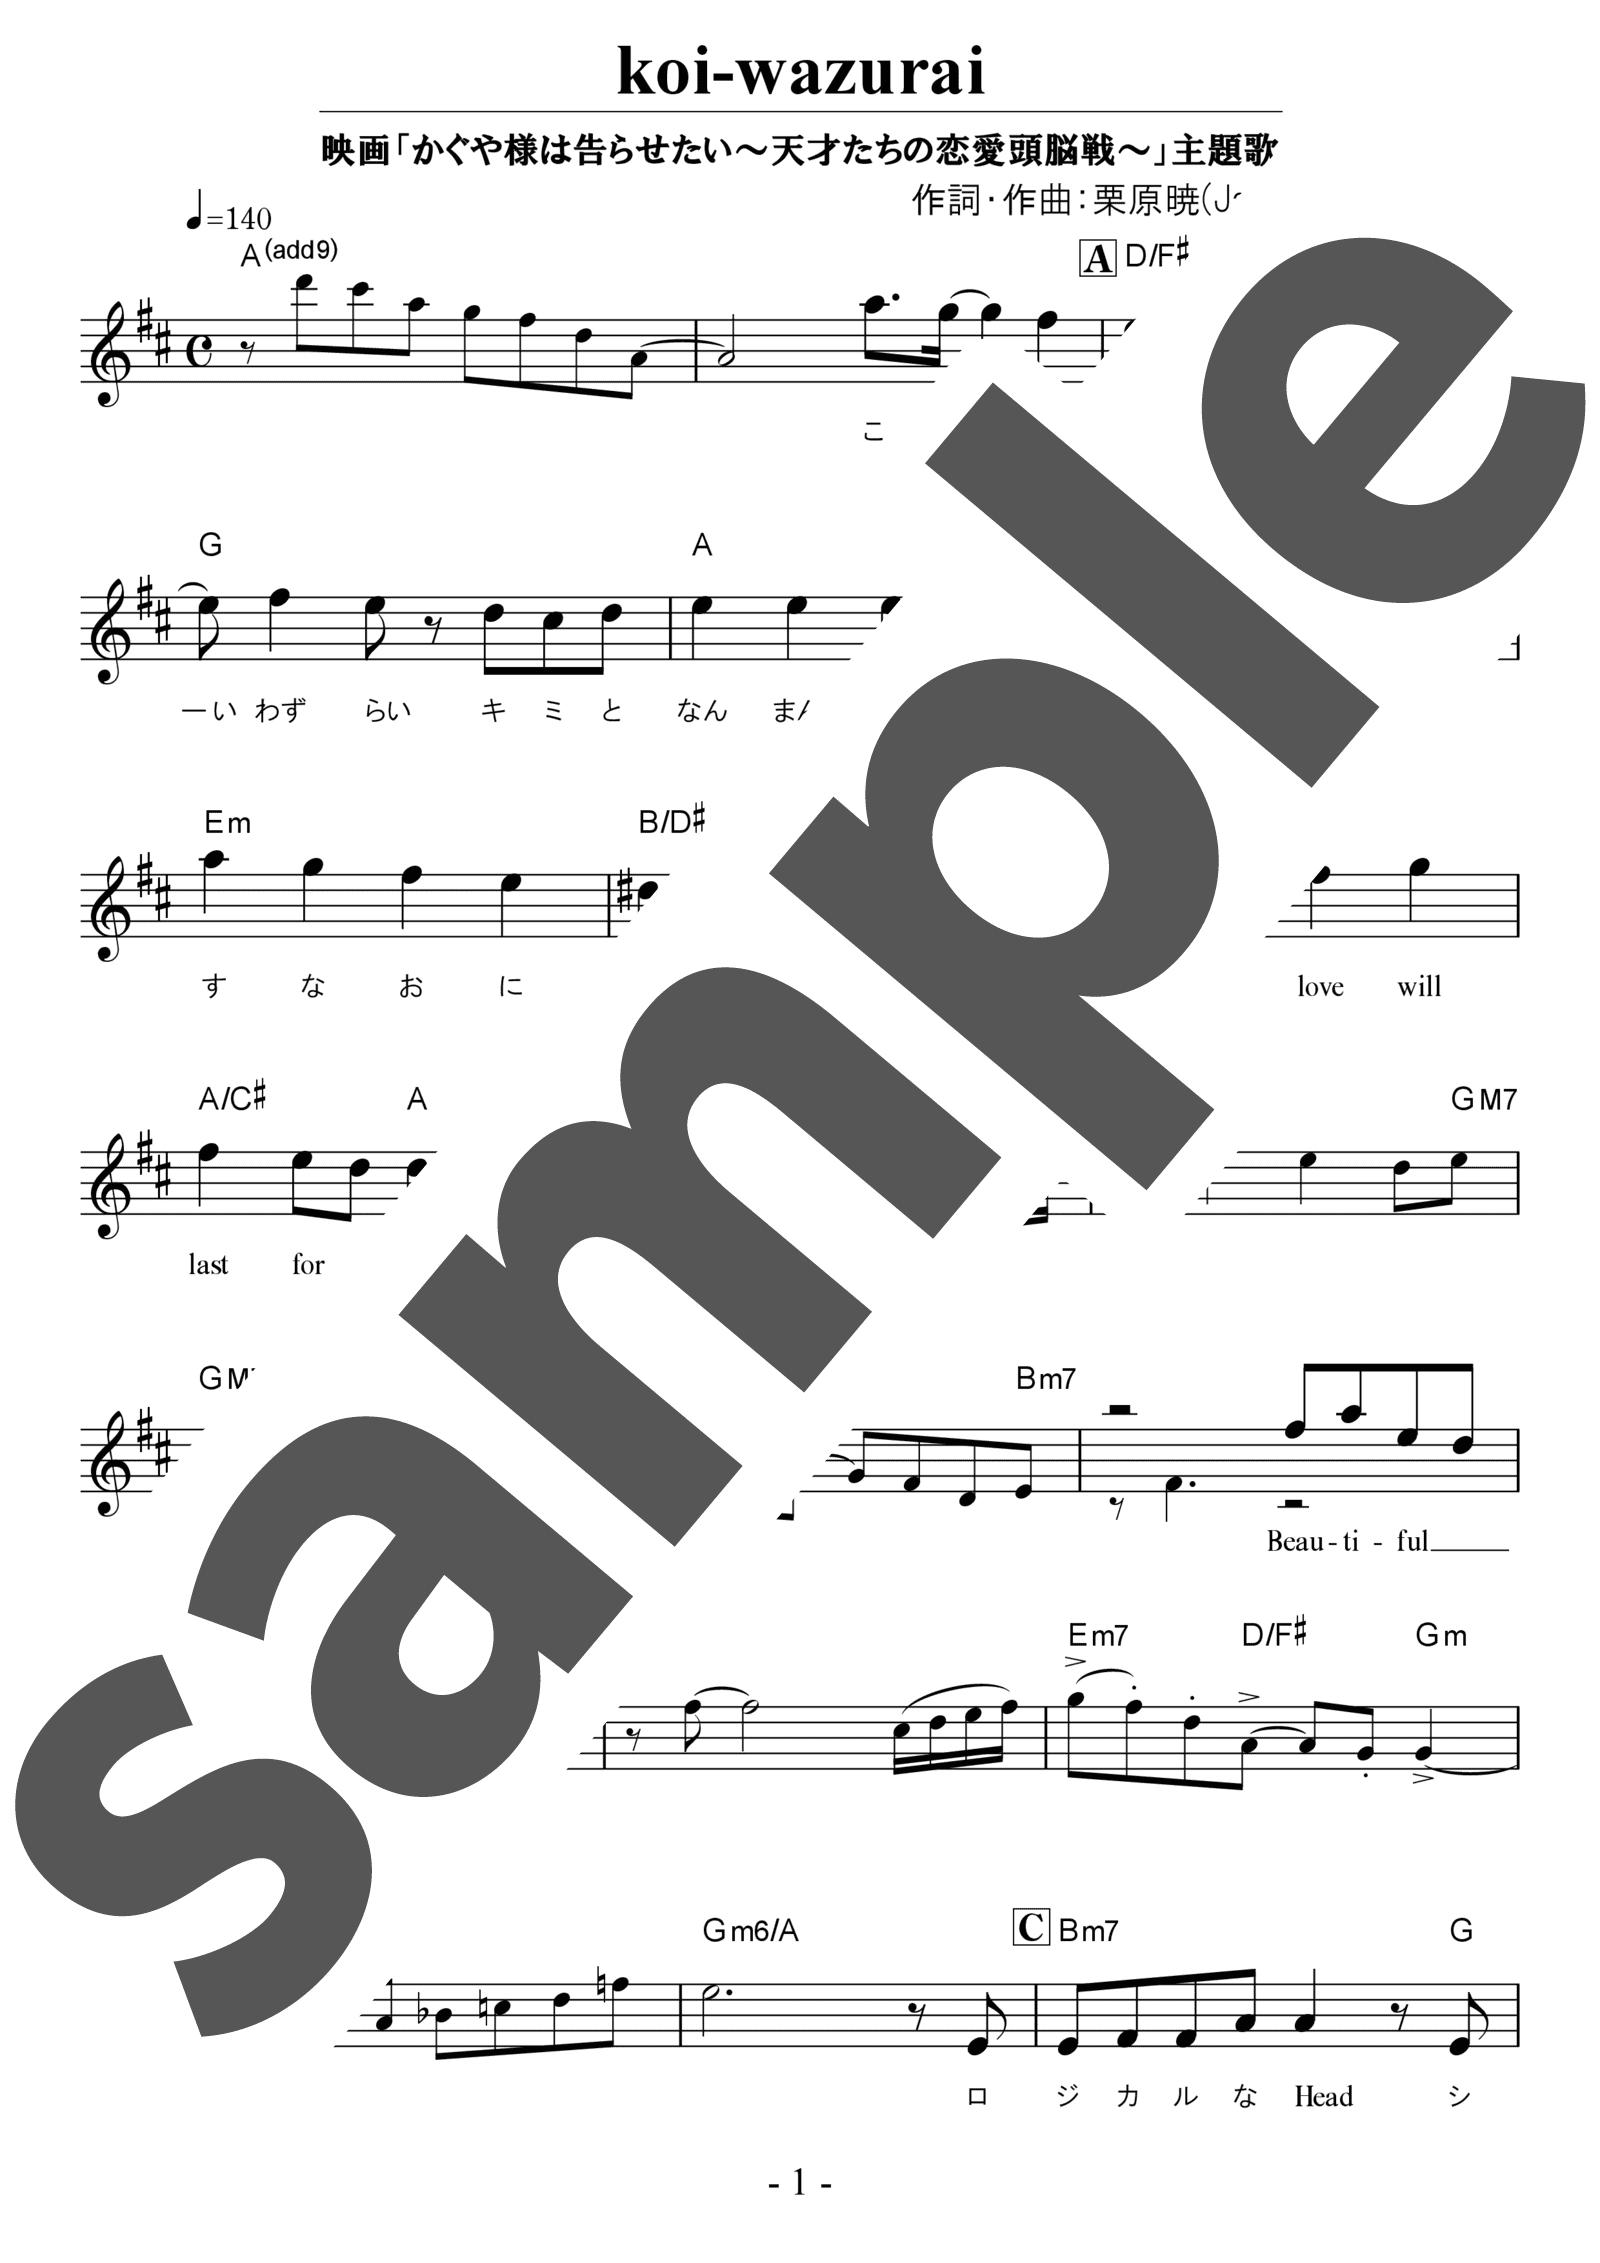 「koi-wazurai」のサンプル楽譜